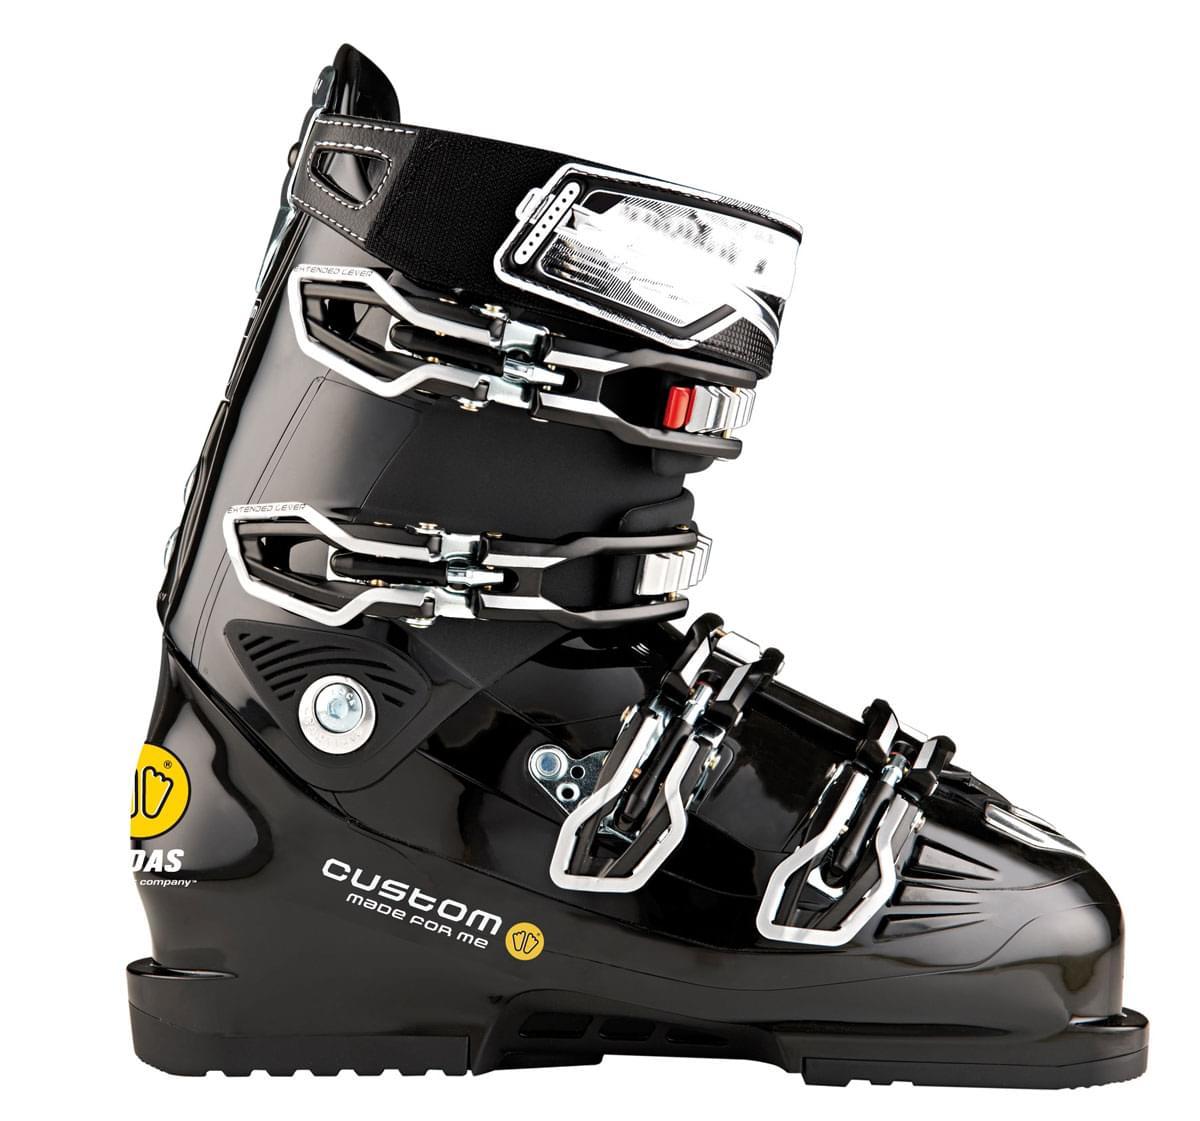 e0711837e46 Zakázkový skelet sjezdové boty Salomon Sidas C-Impact - Ski a Bike ...